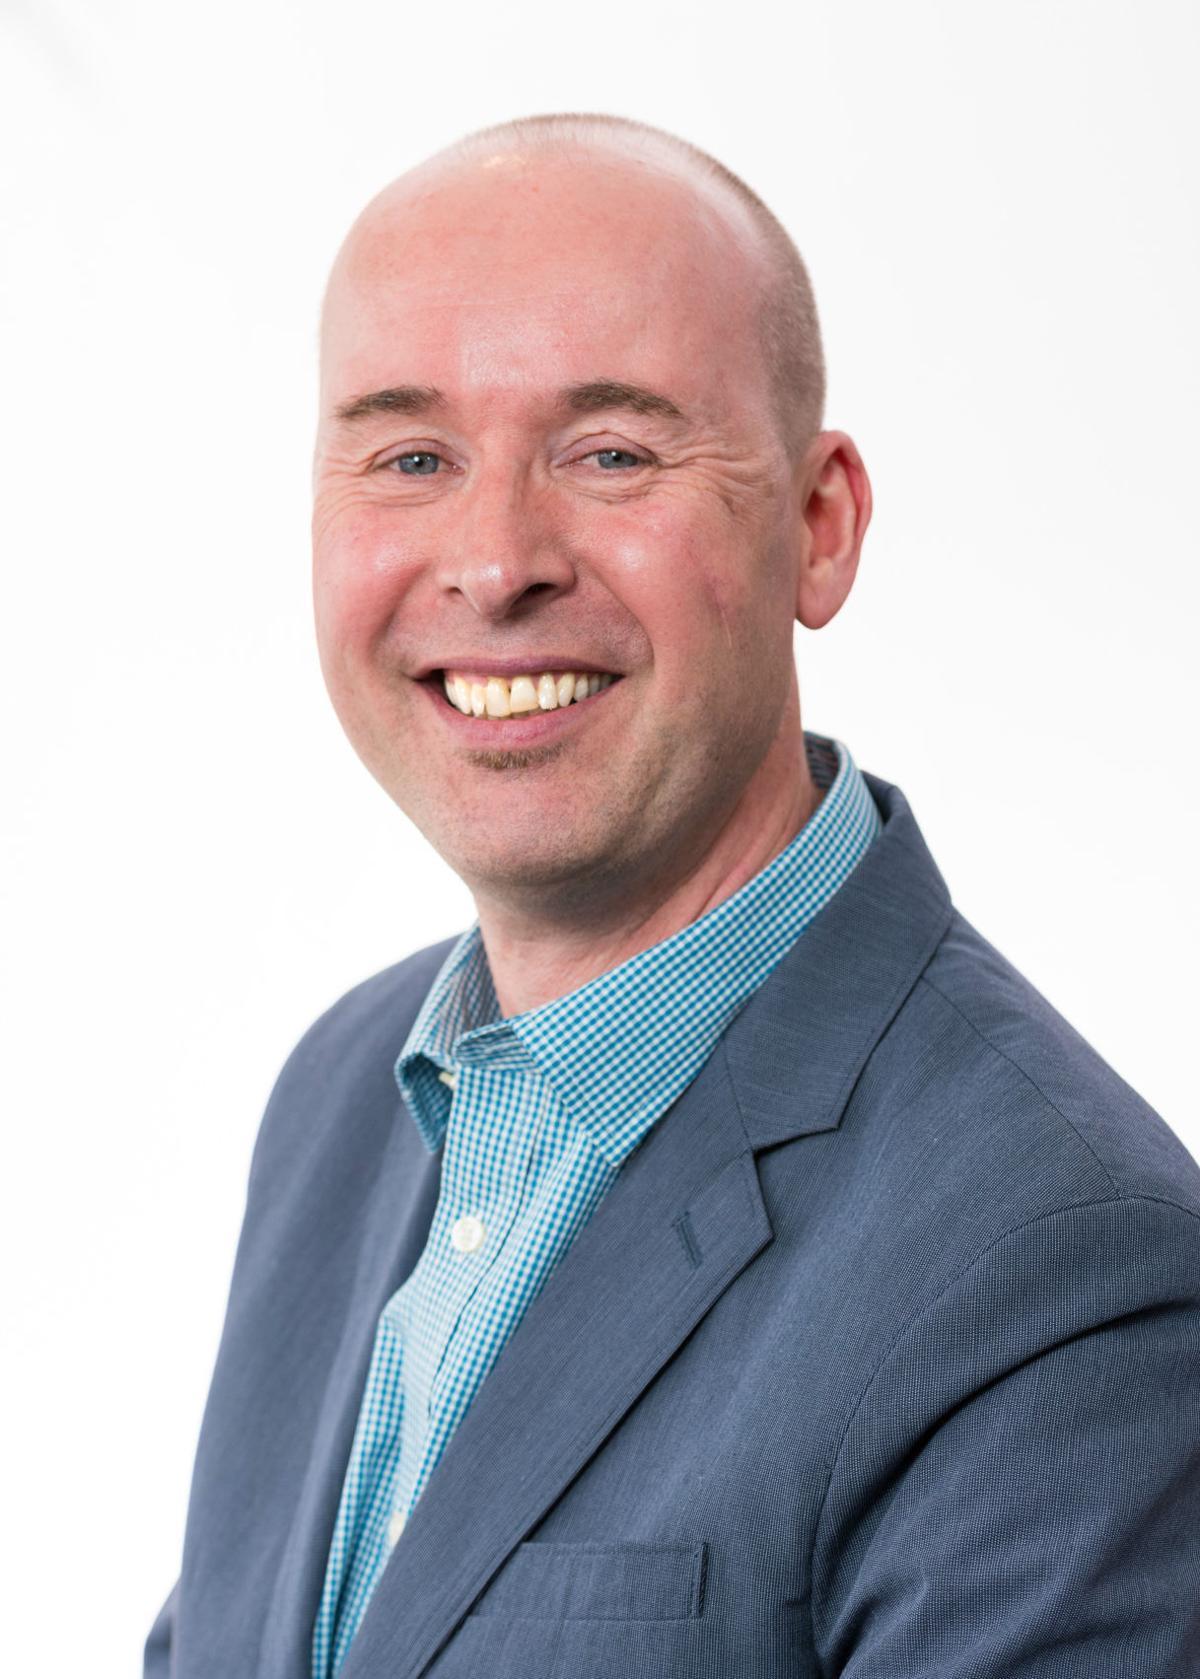 North Douglas County Mental Health Provider Gets New Director